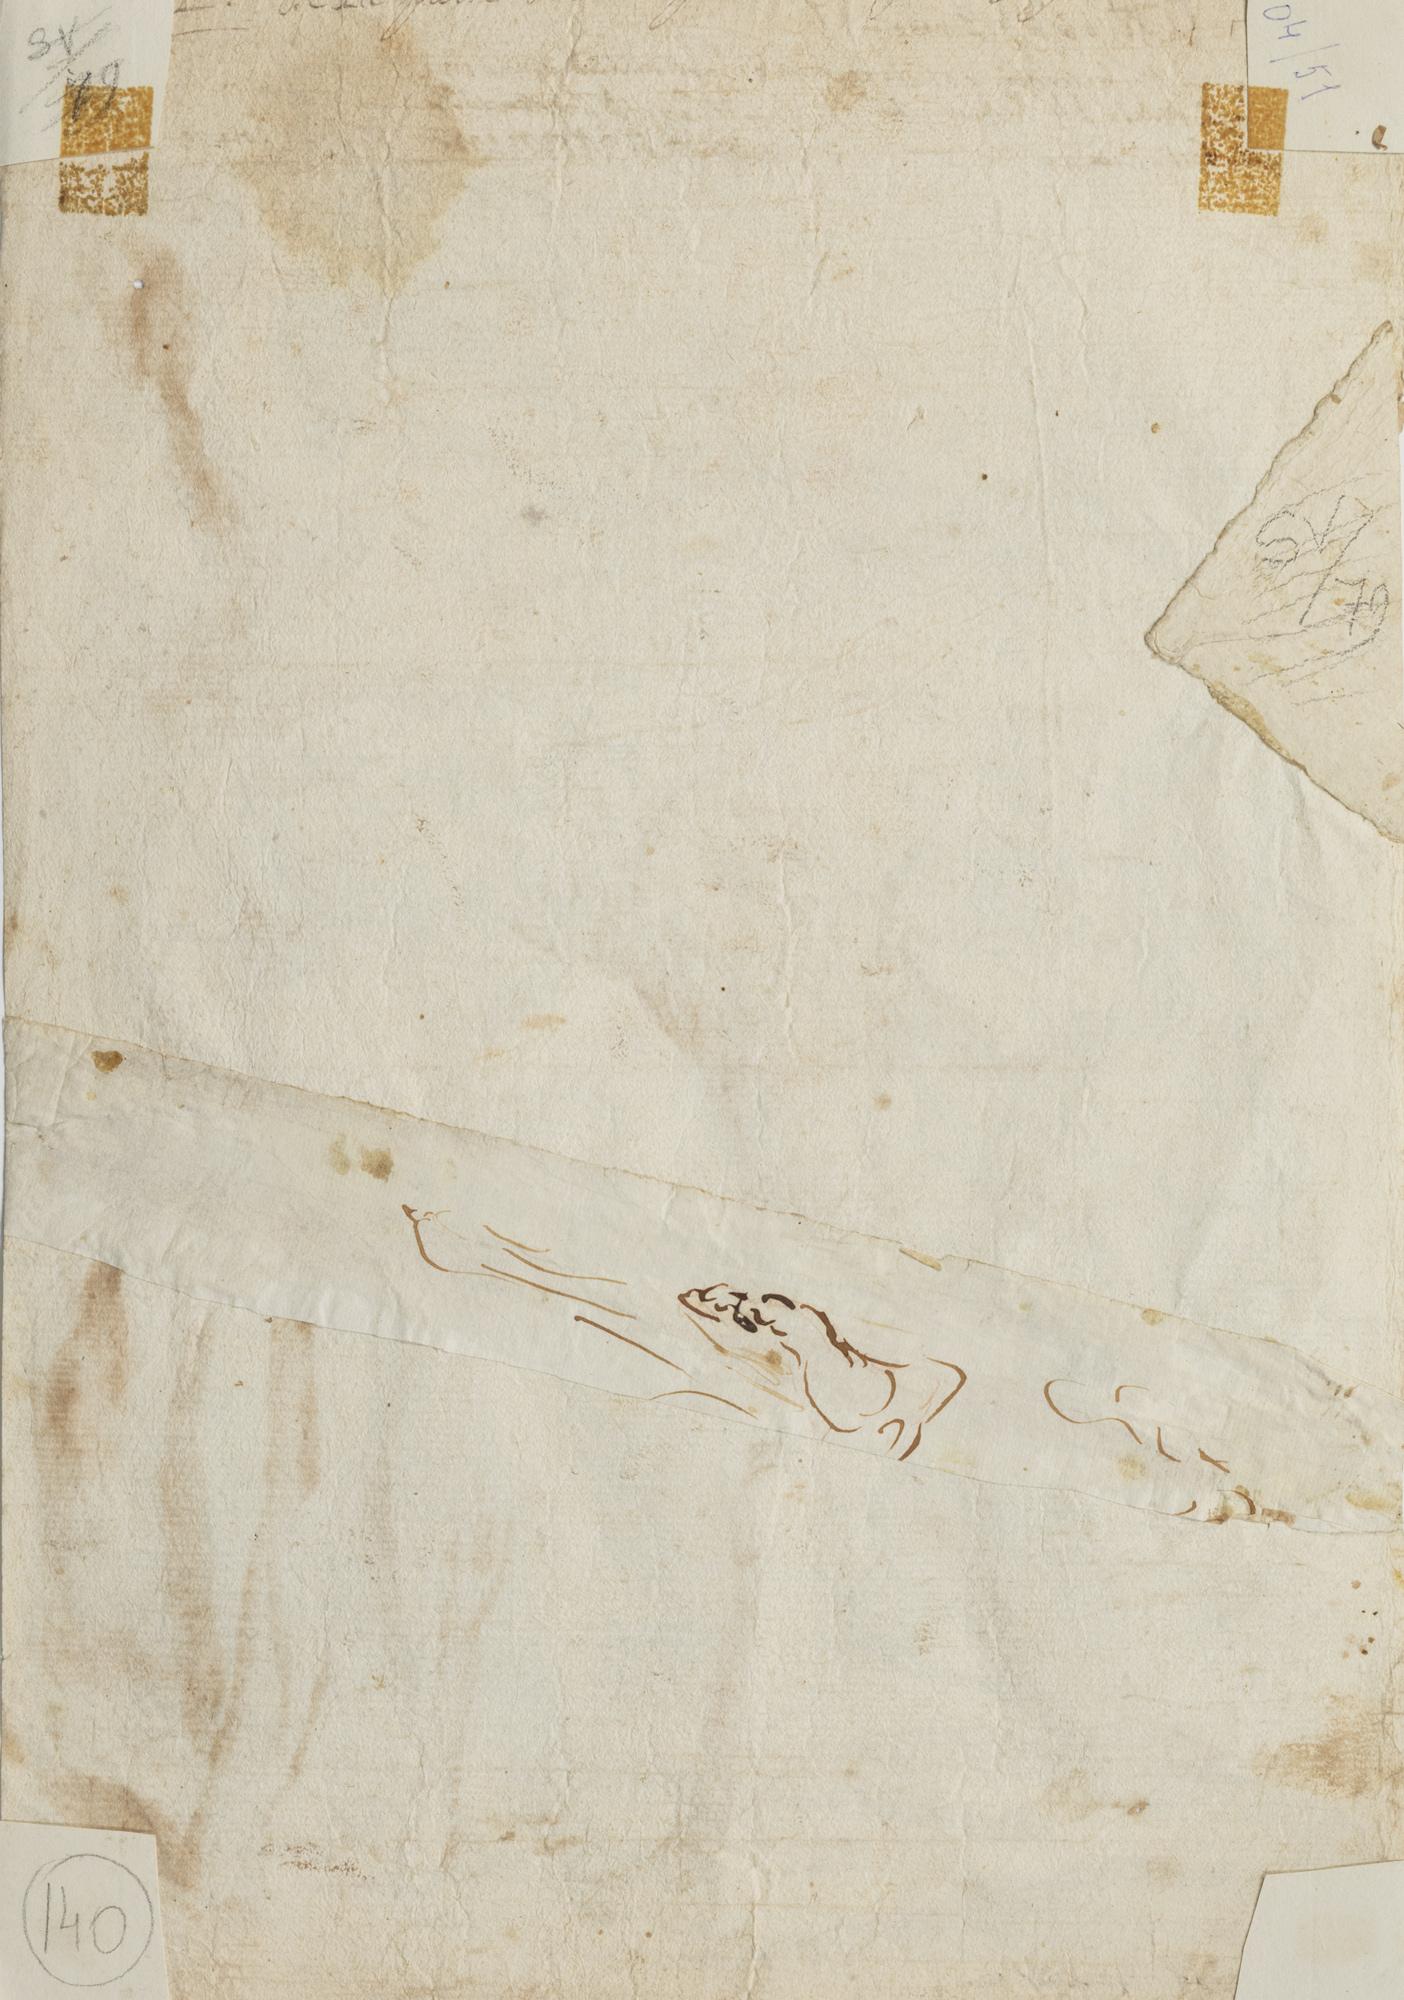 Martirio di san Pietro da Verona